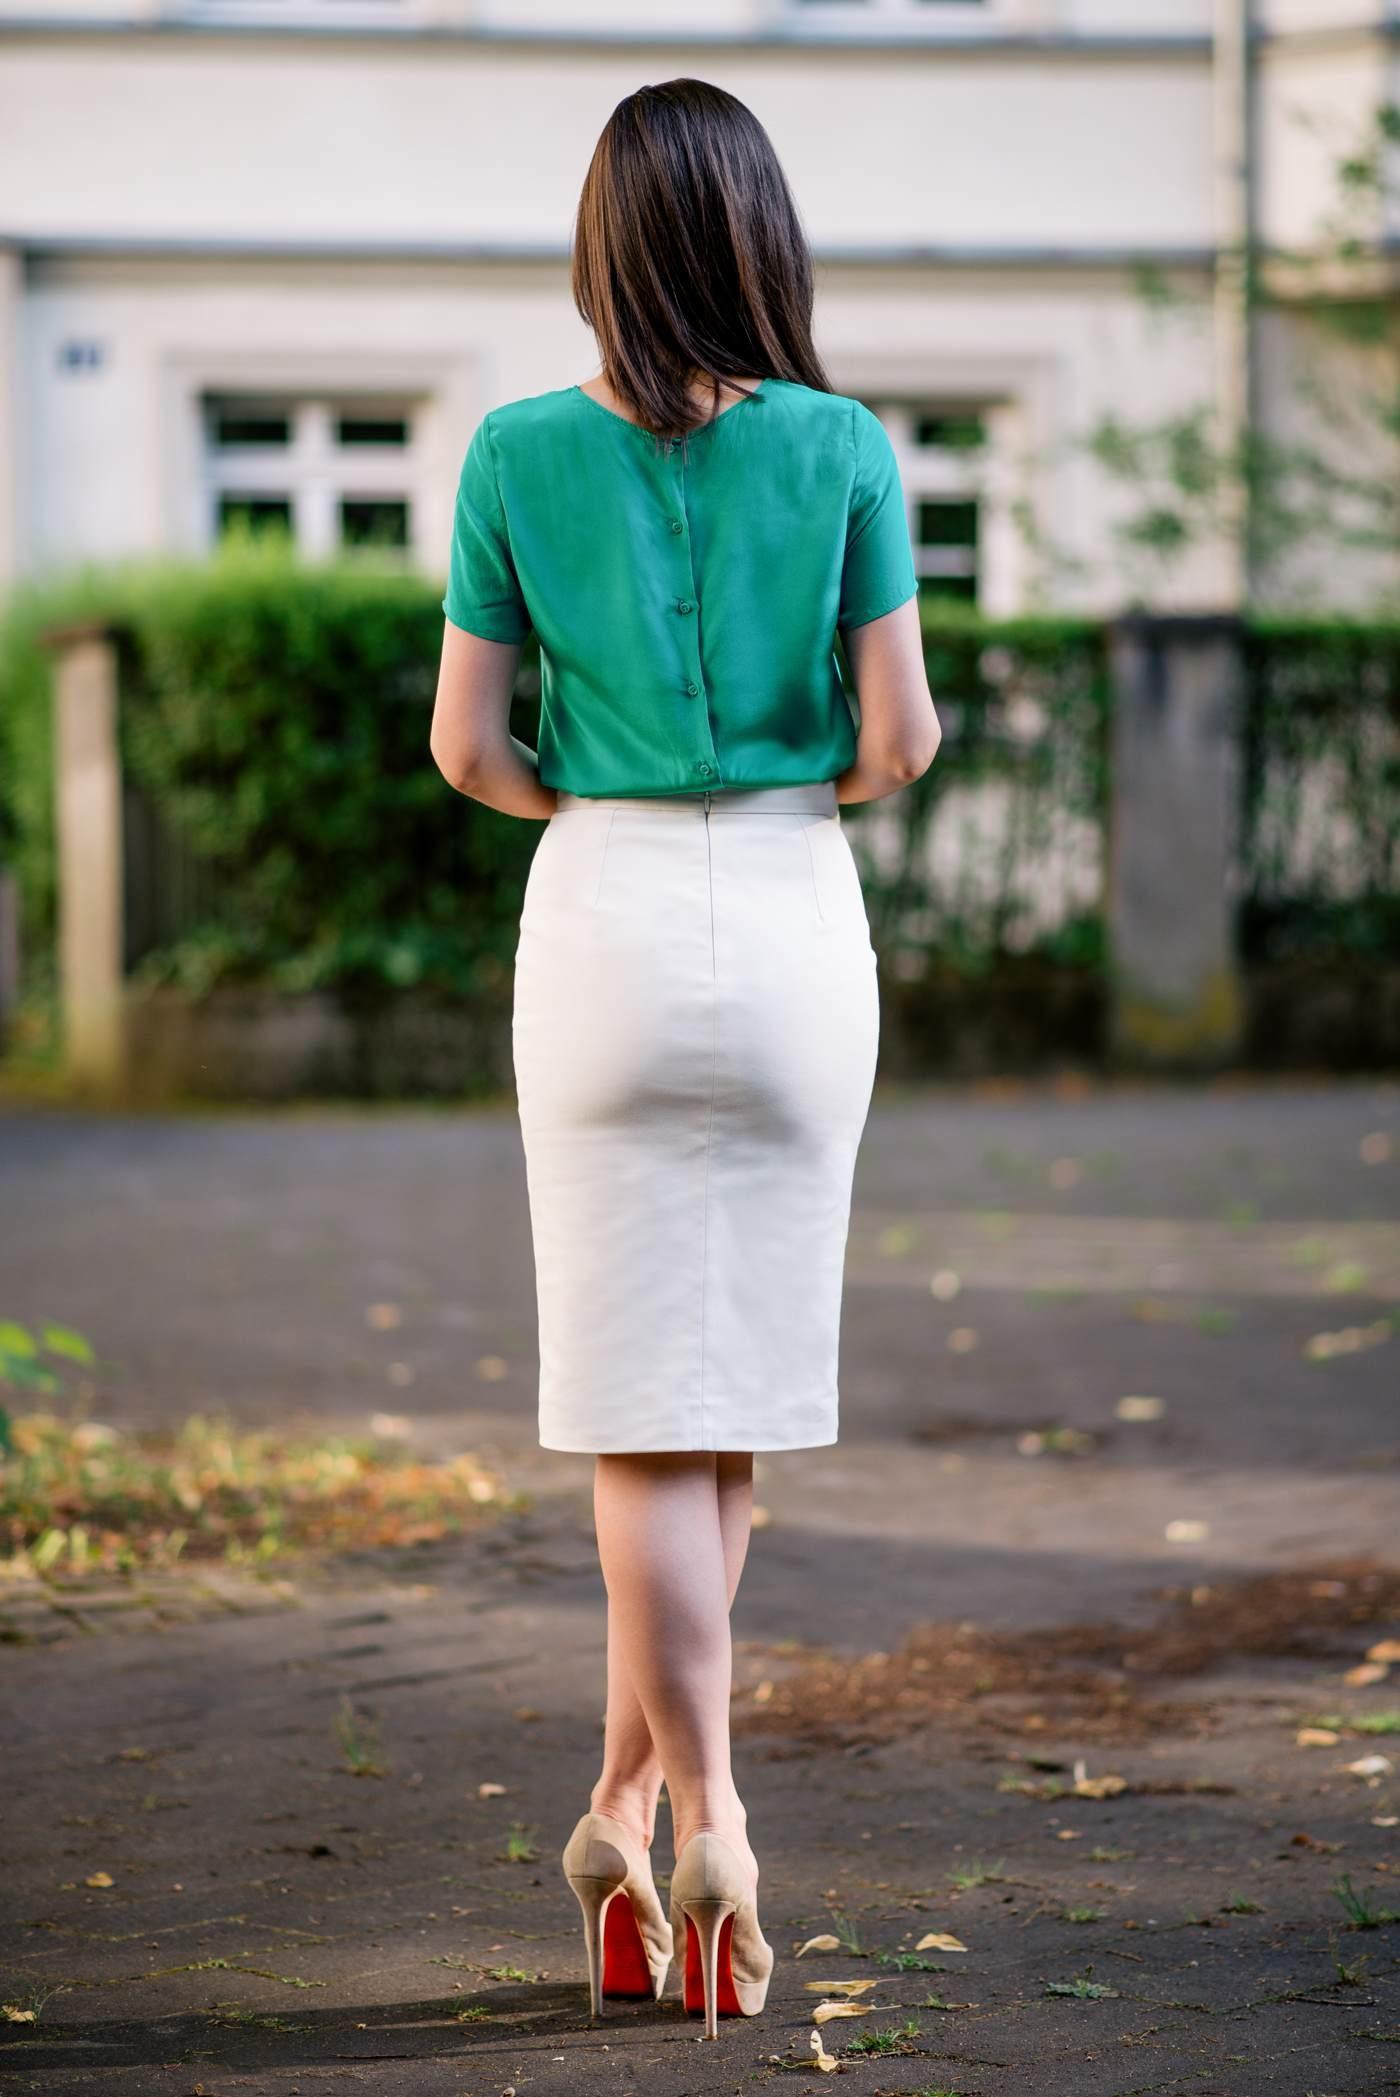 pantone-emerald-green-outfit-DSC_2807